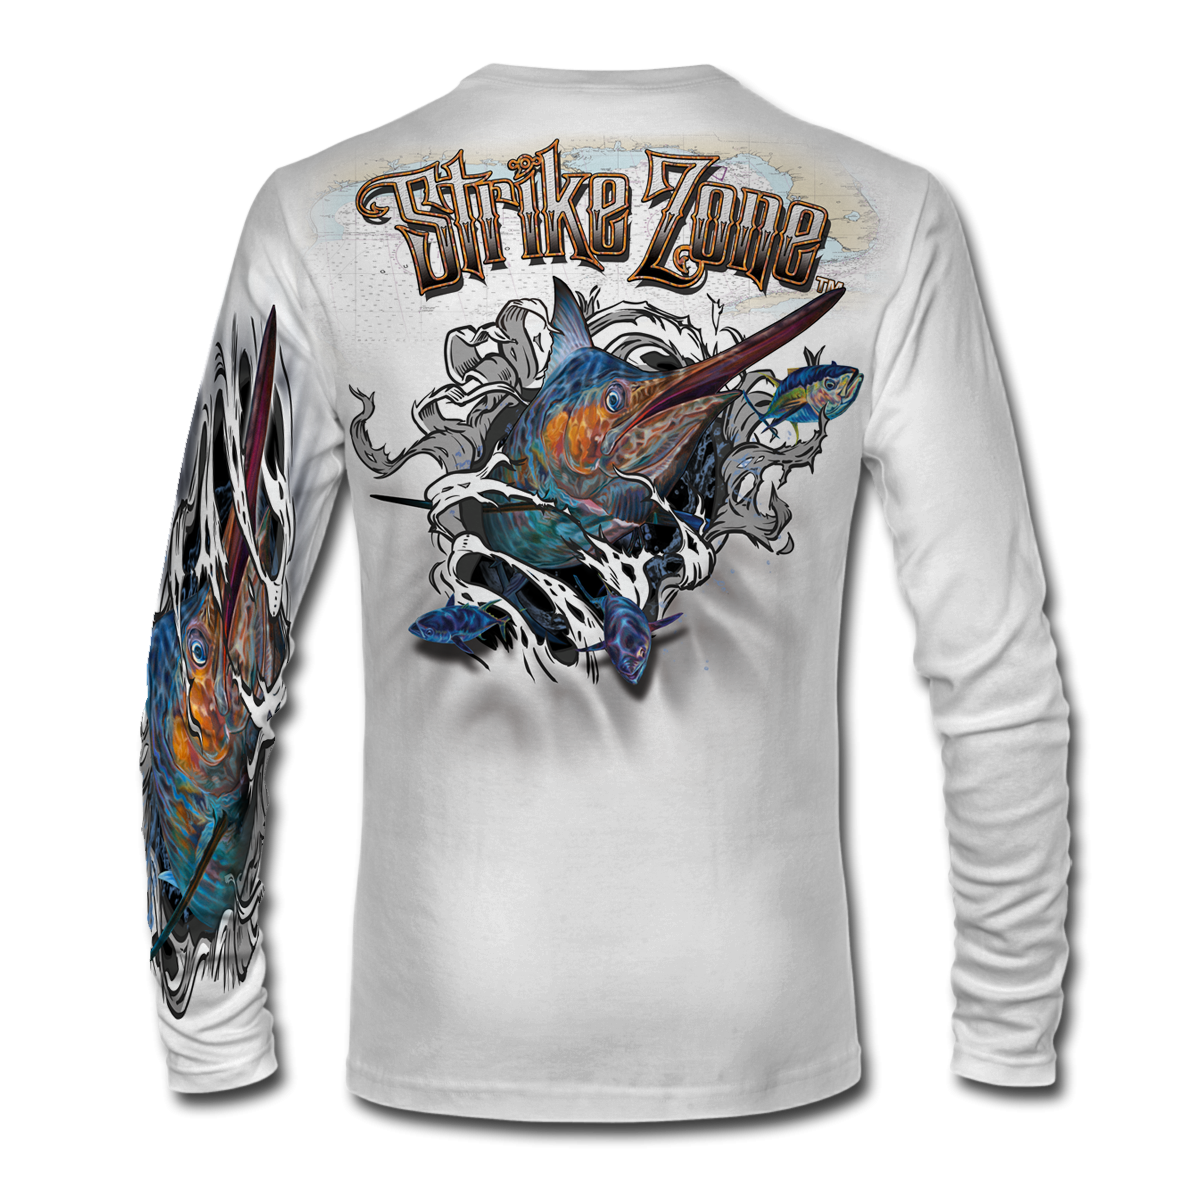 jason-mathias-strike-zone-white-blue-marlin-fishing-shirt.png